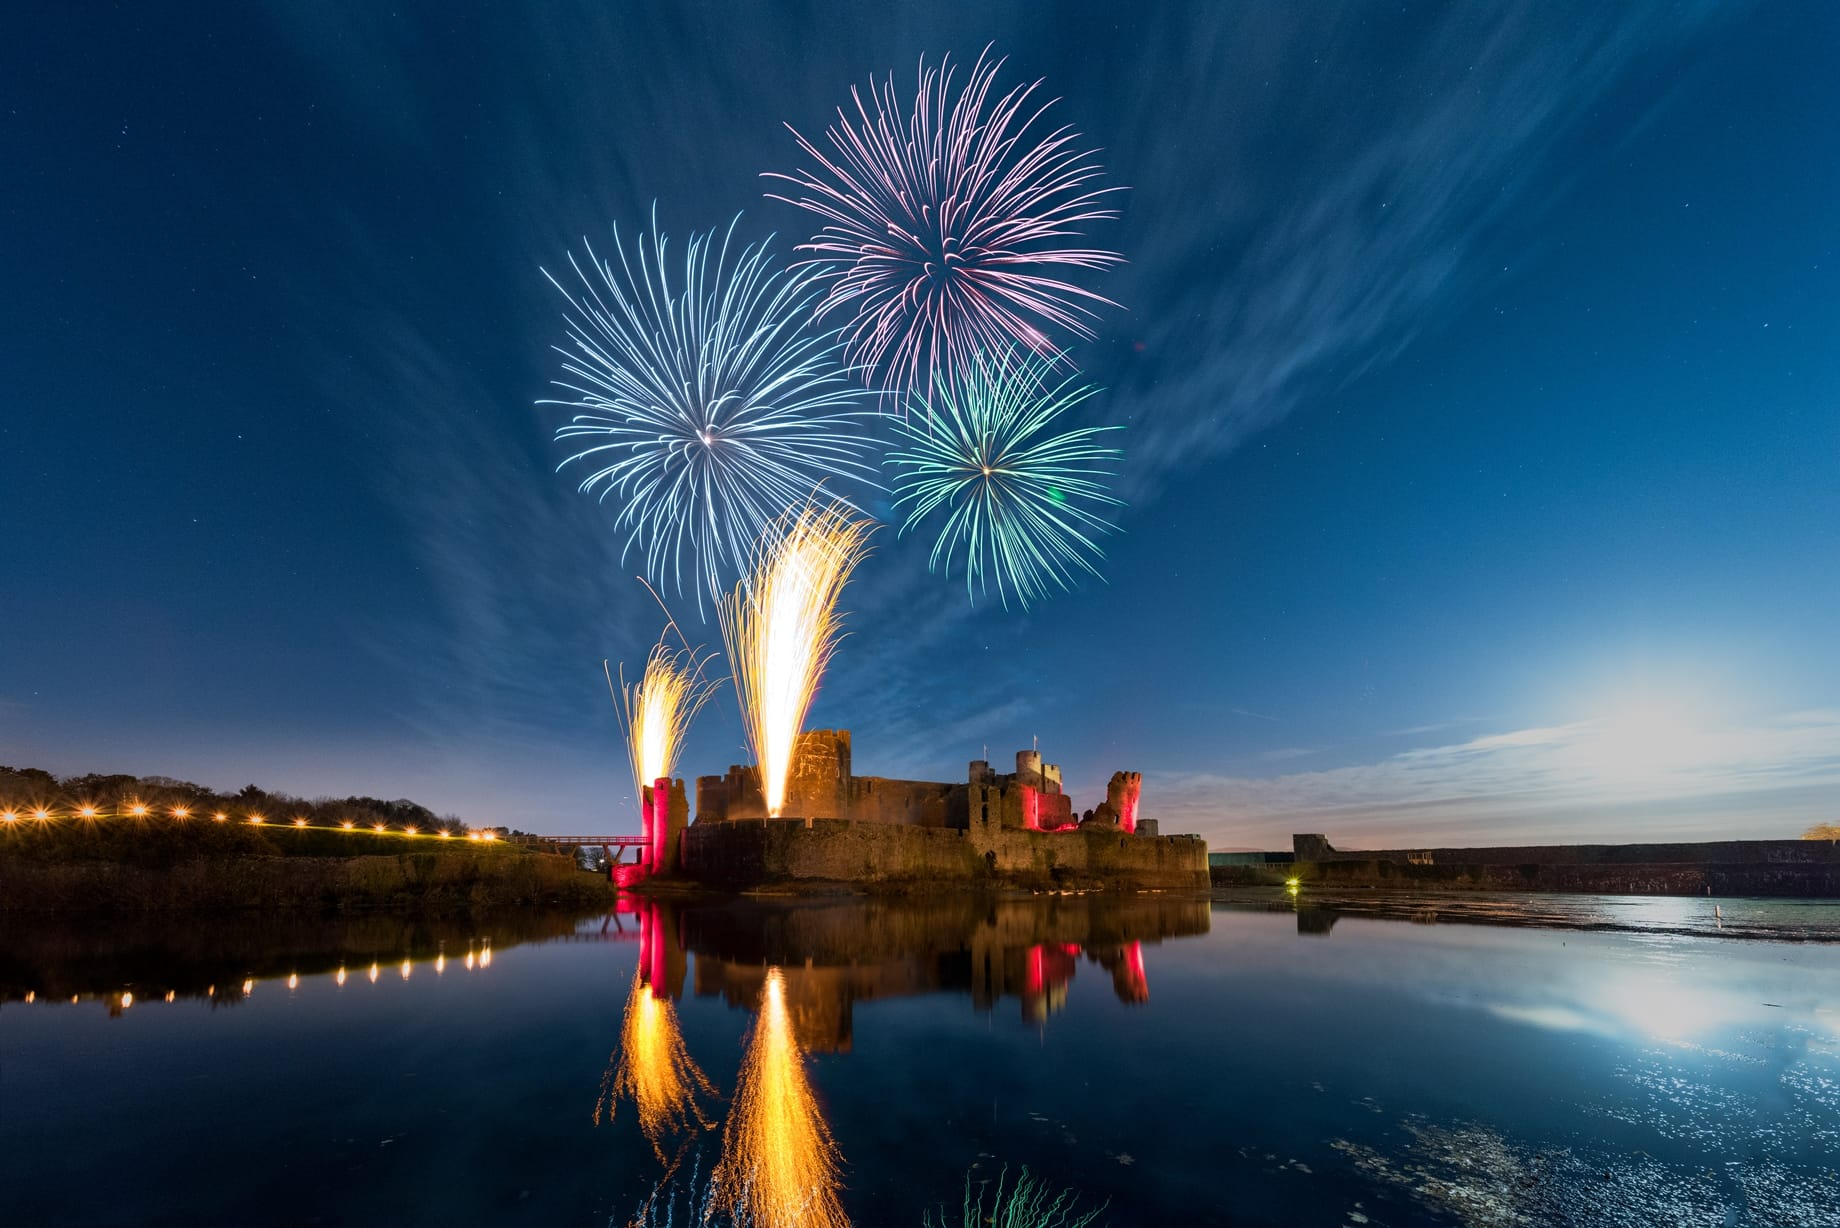 Caerphilly Castle Fireworks